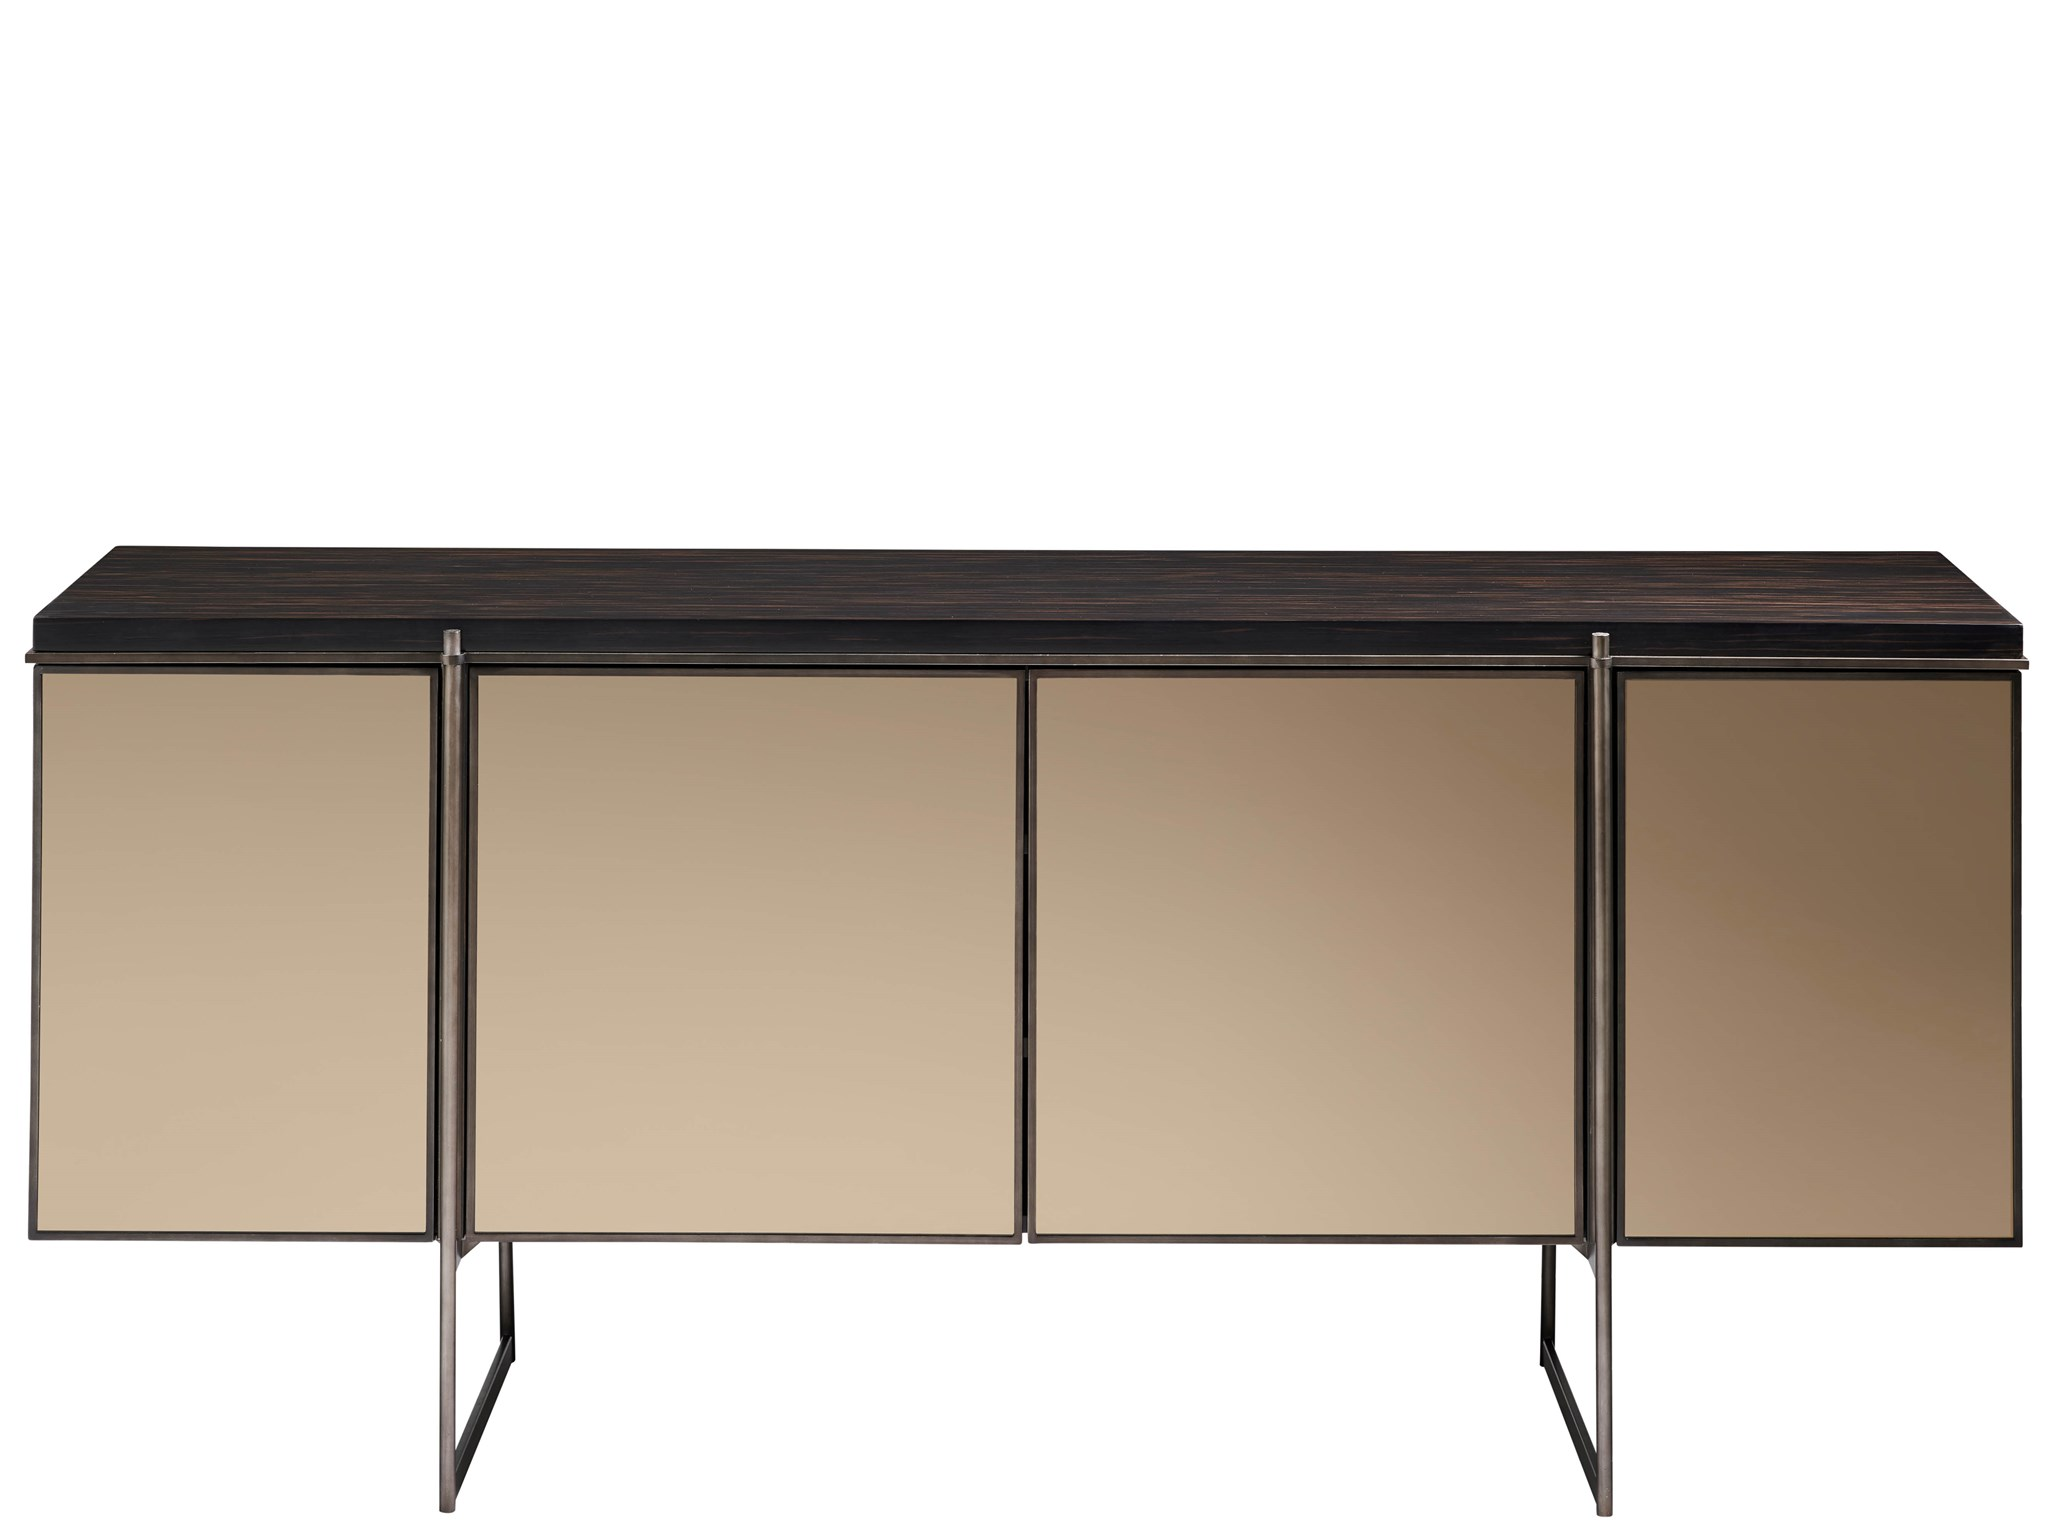 Nina Magon Mondrian Sideboard Universal Furniture